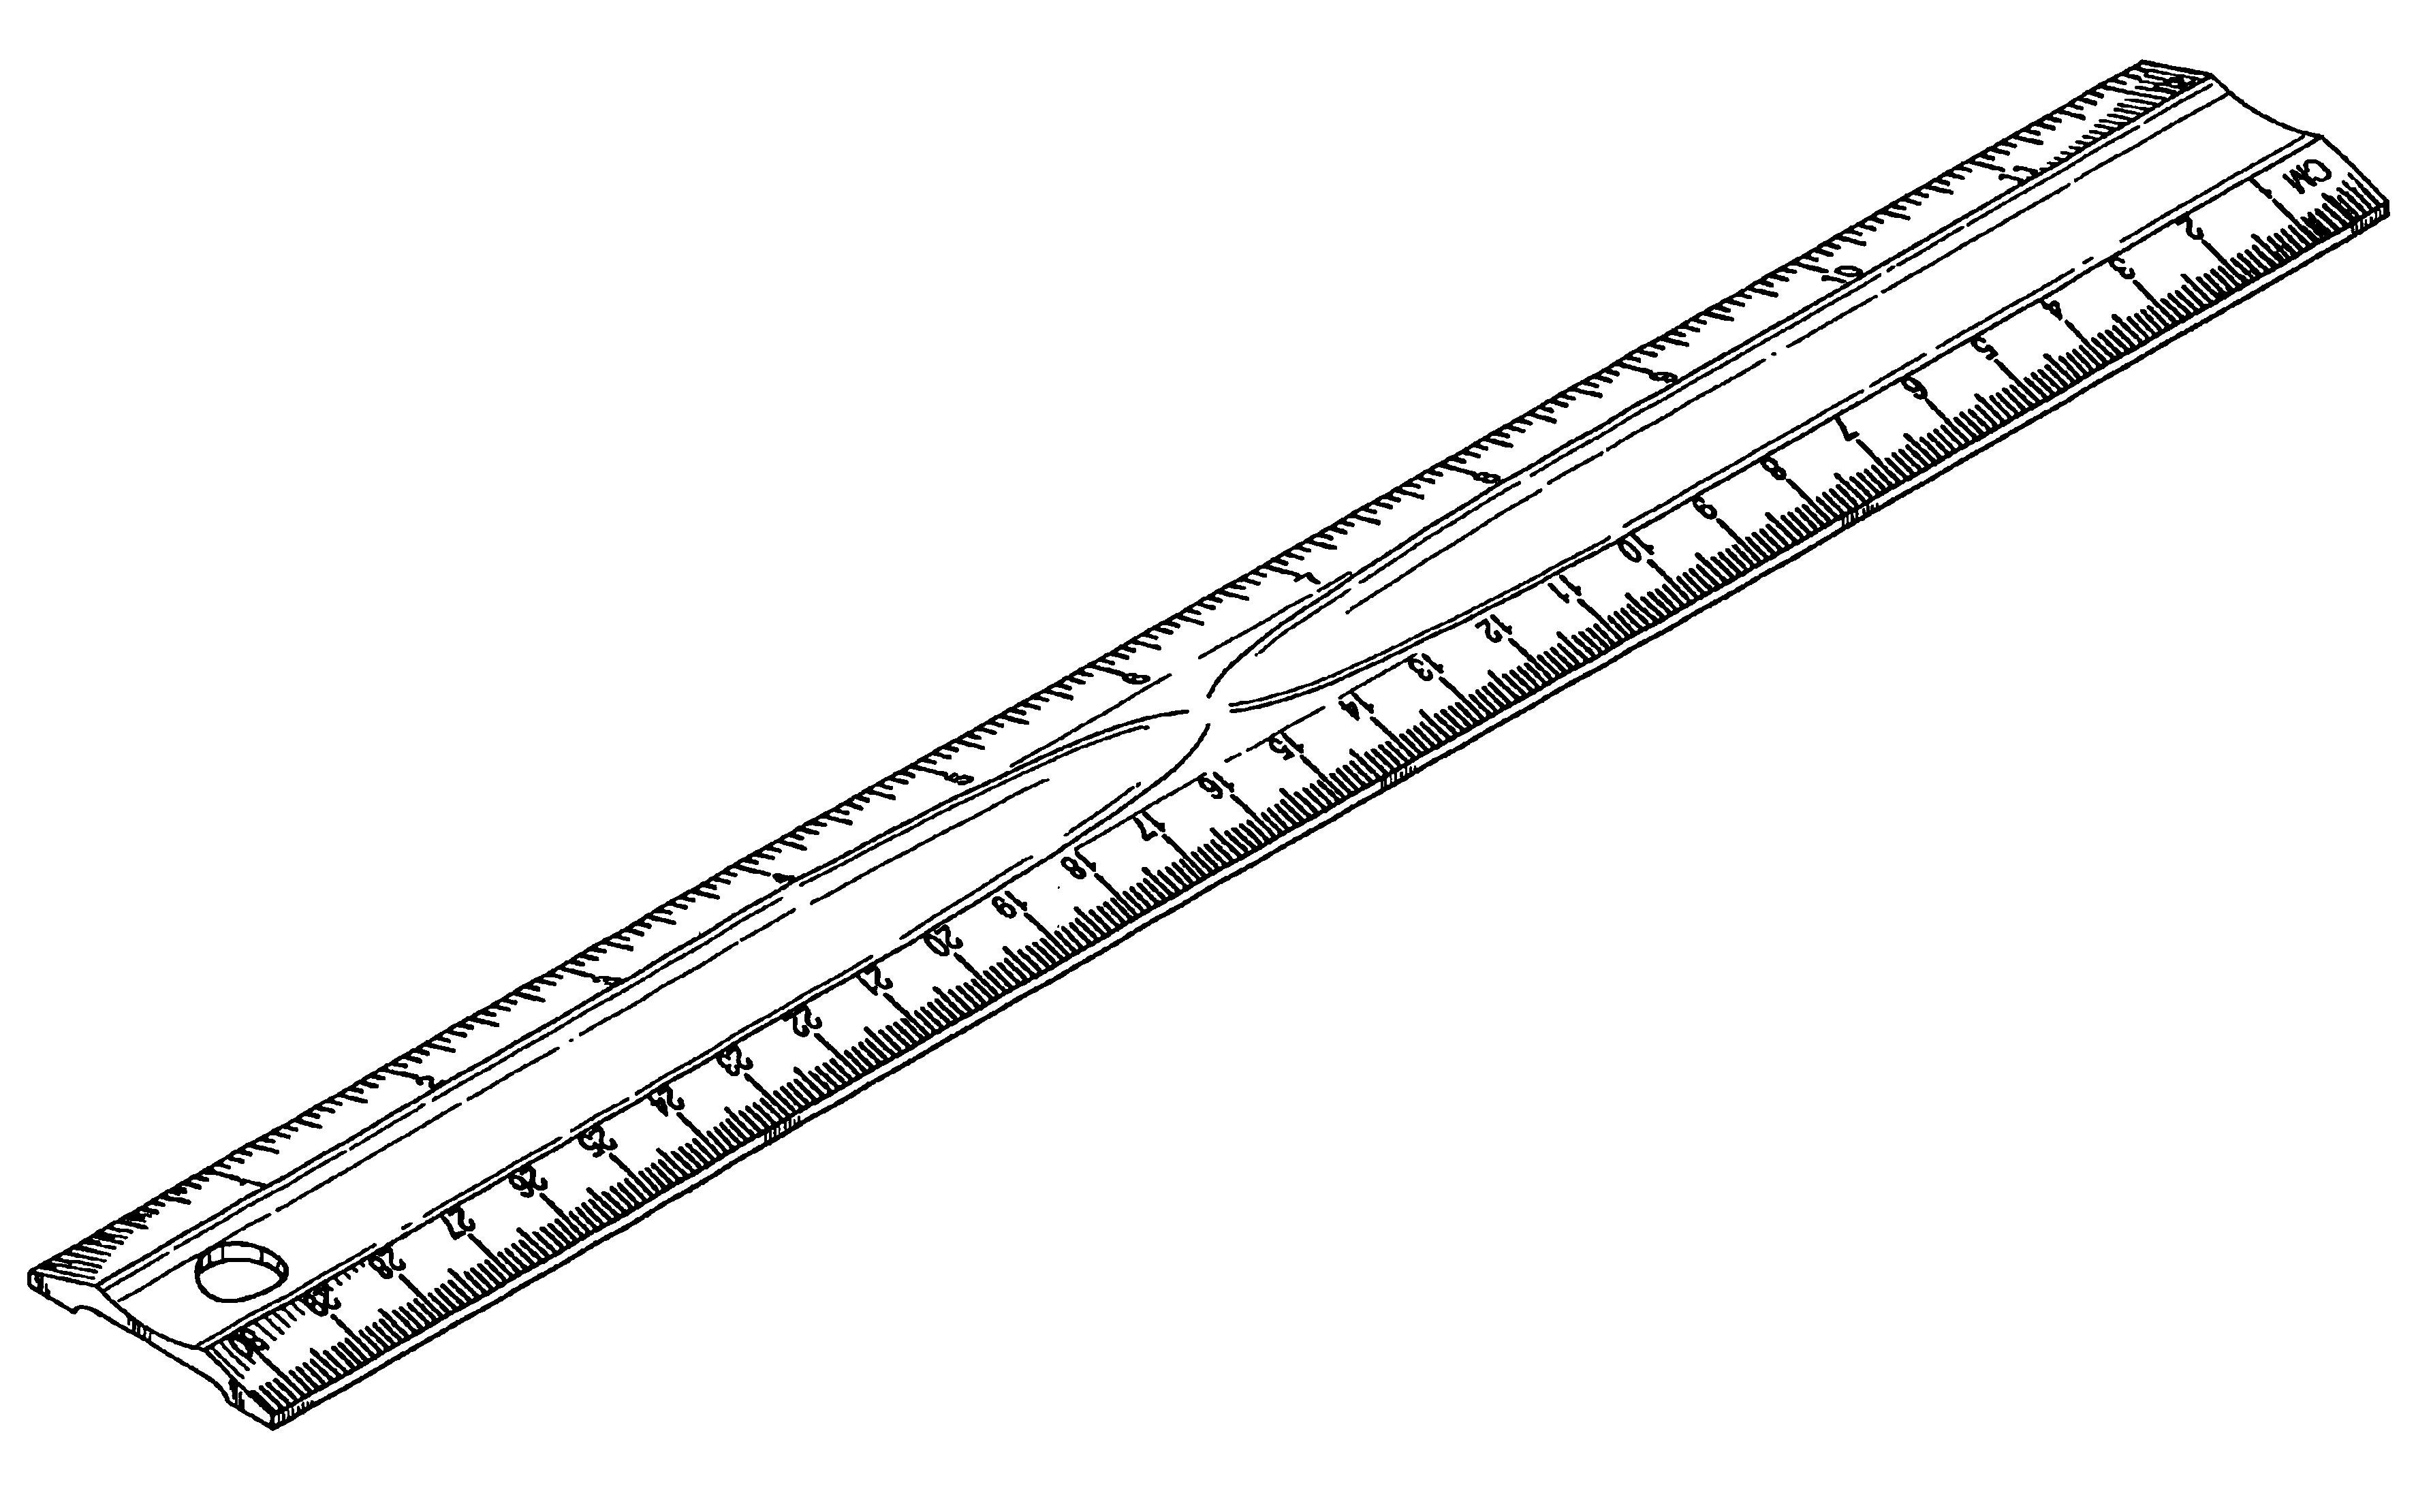 Free Ruler Cliparts, Download Free Clip Art, Free Clip Art.